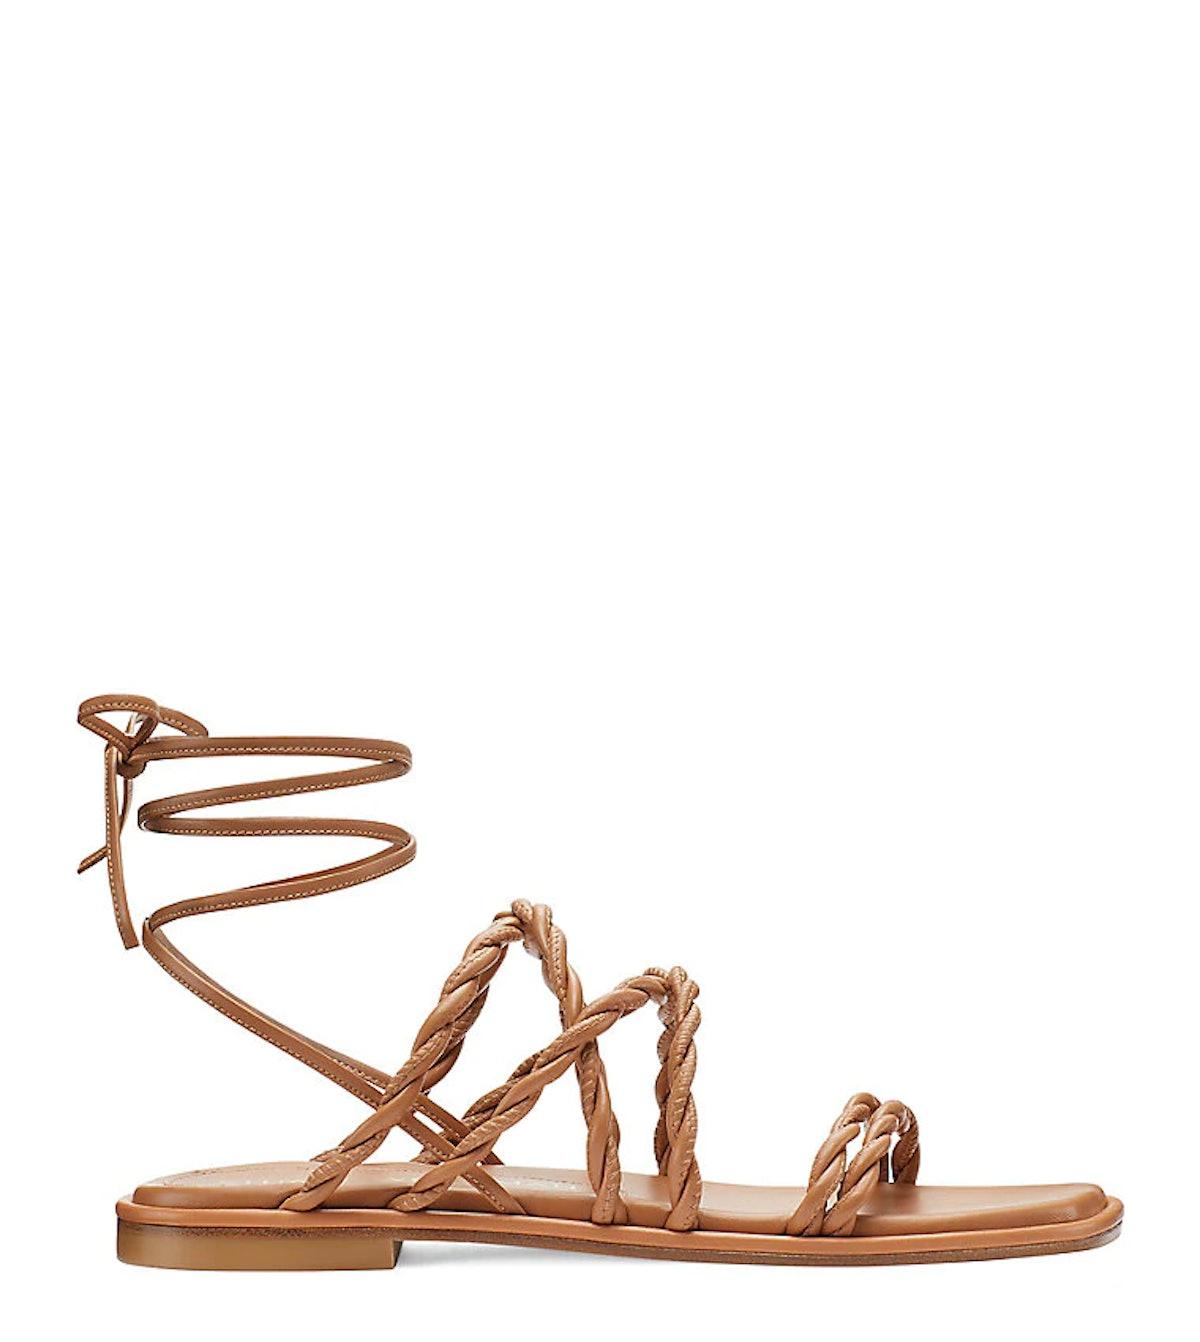 Calypso Lace-Up Sandal